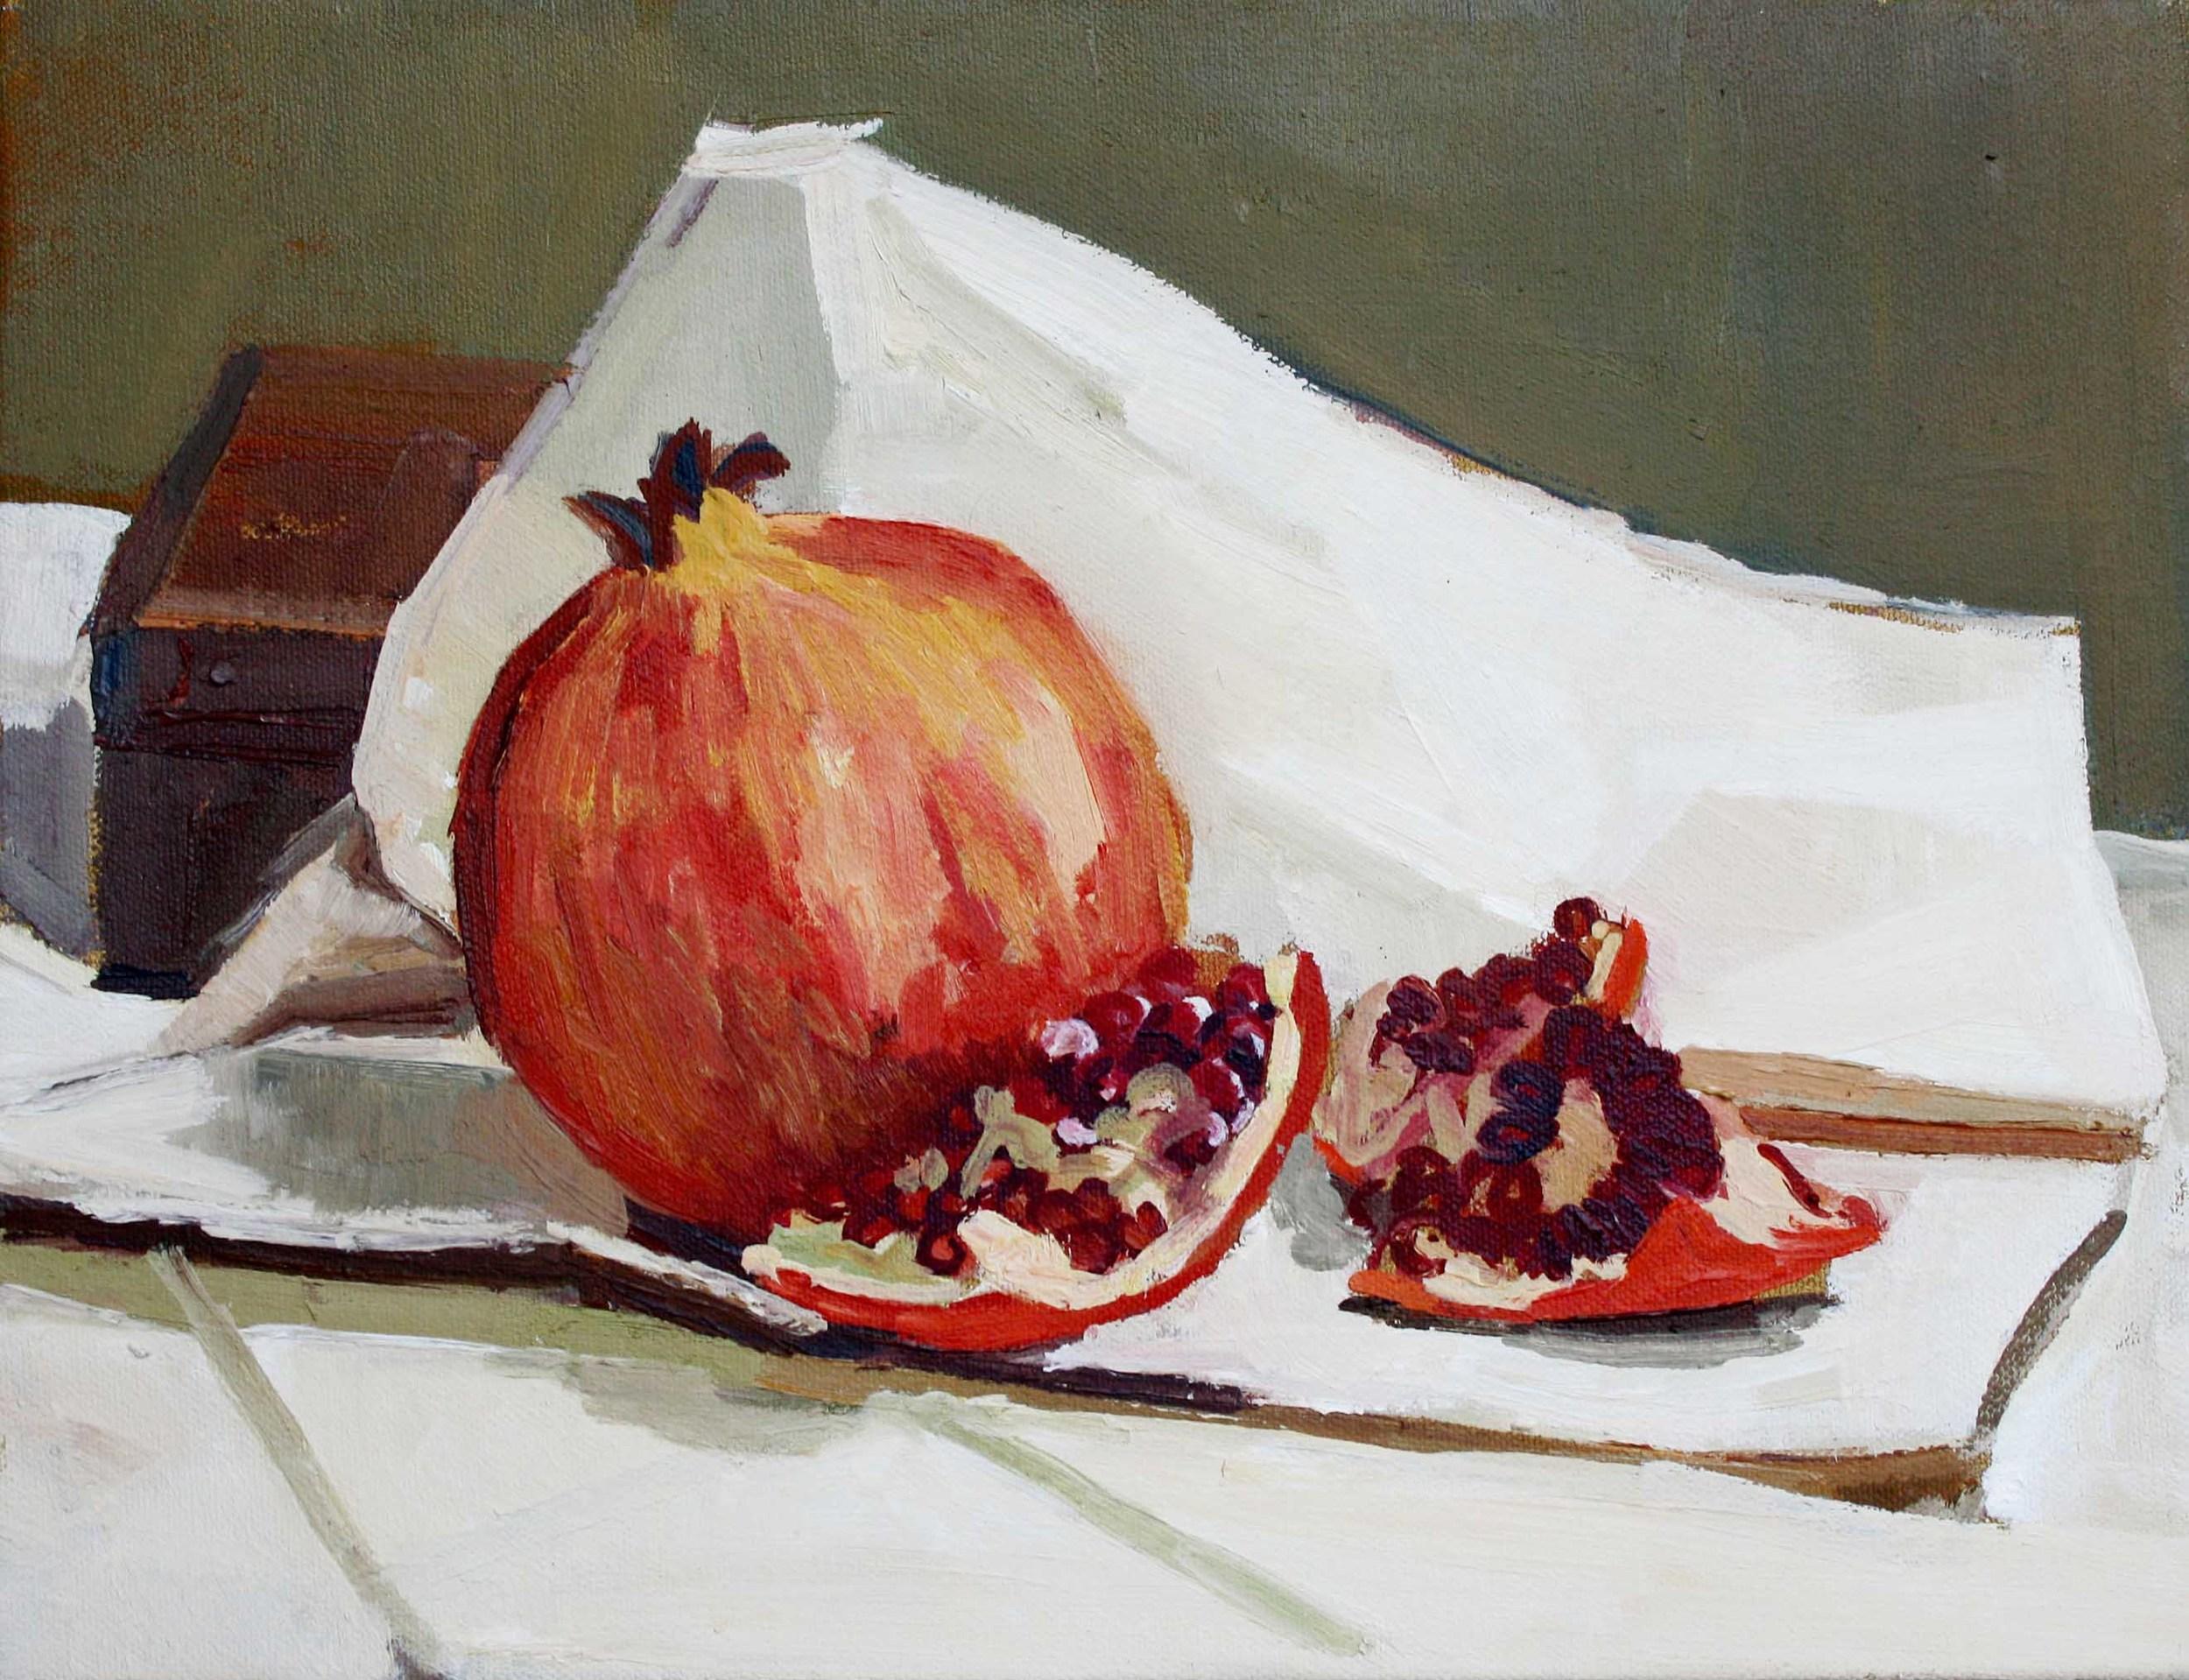 Pomegranate 35 x 27 cm, Oil on canvas